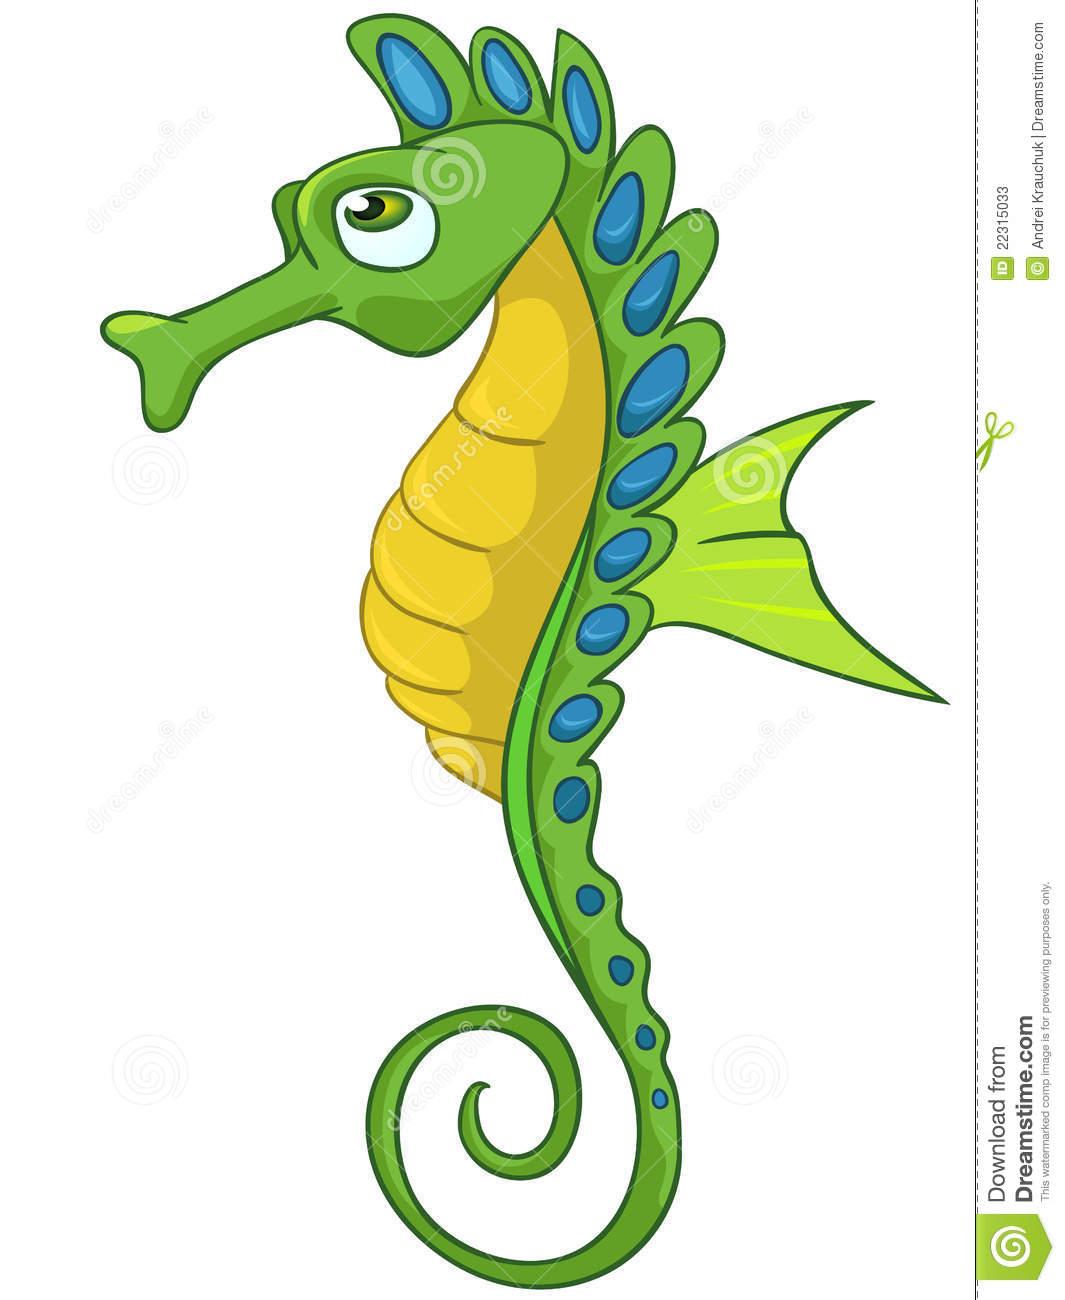 Seahorse clipart #8